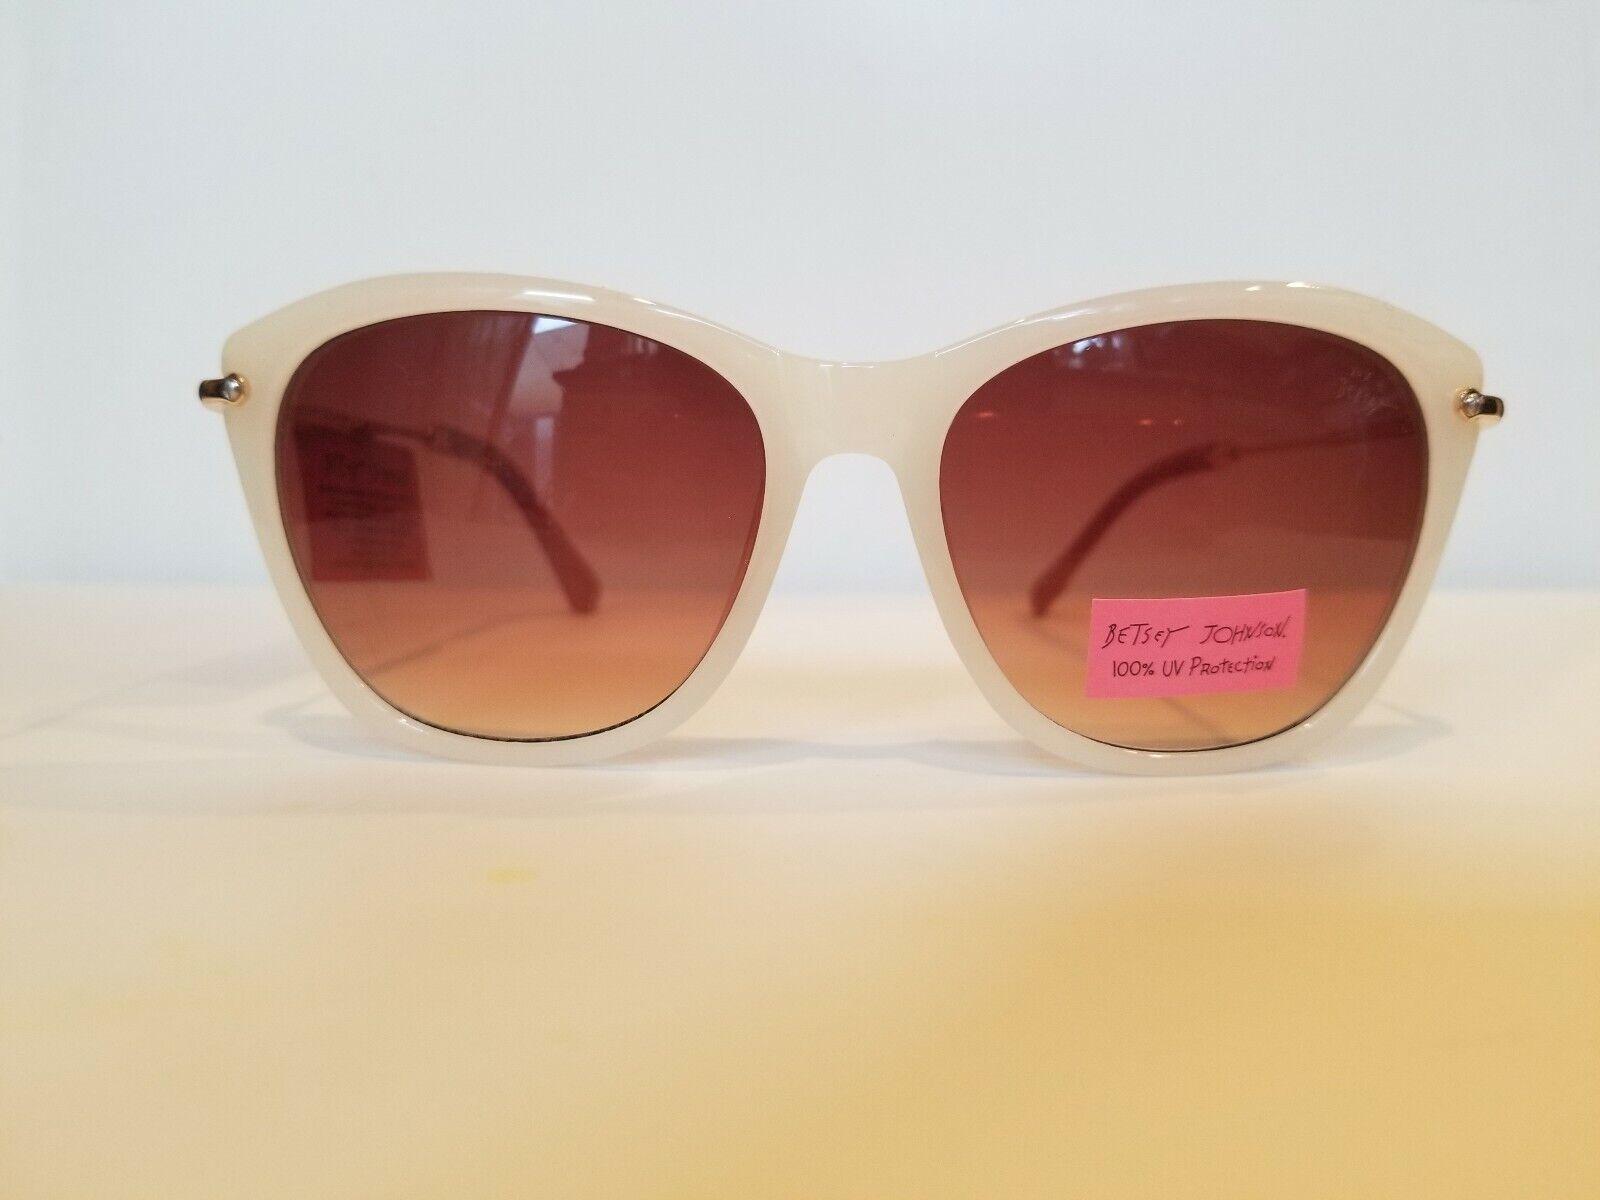 Nwt Betsey Johnson Cream Cateye Sunglasses Brown Lens